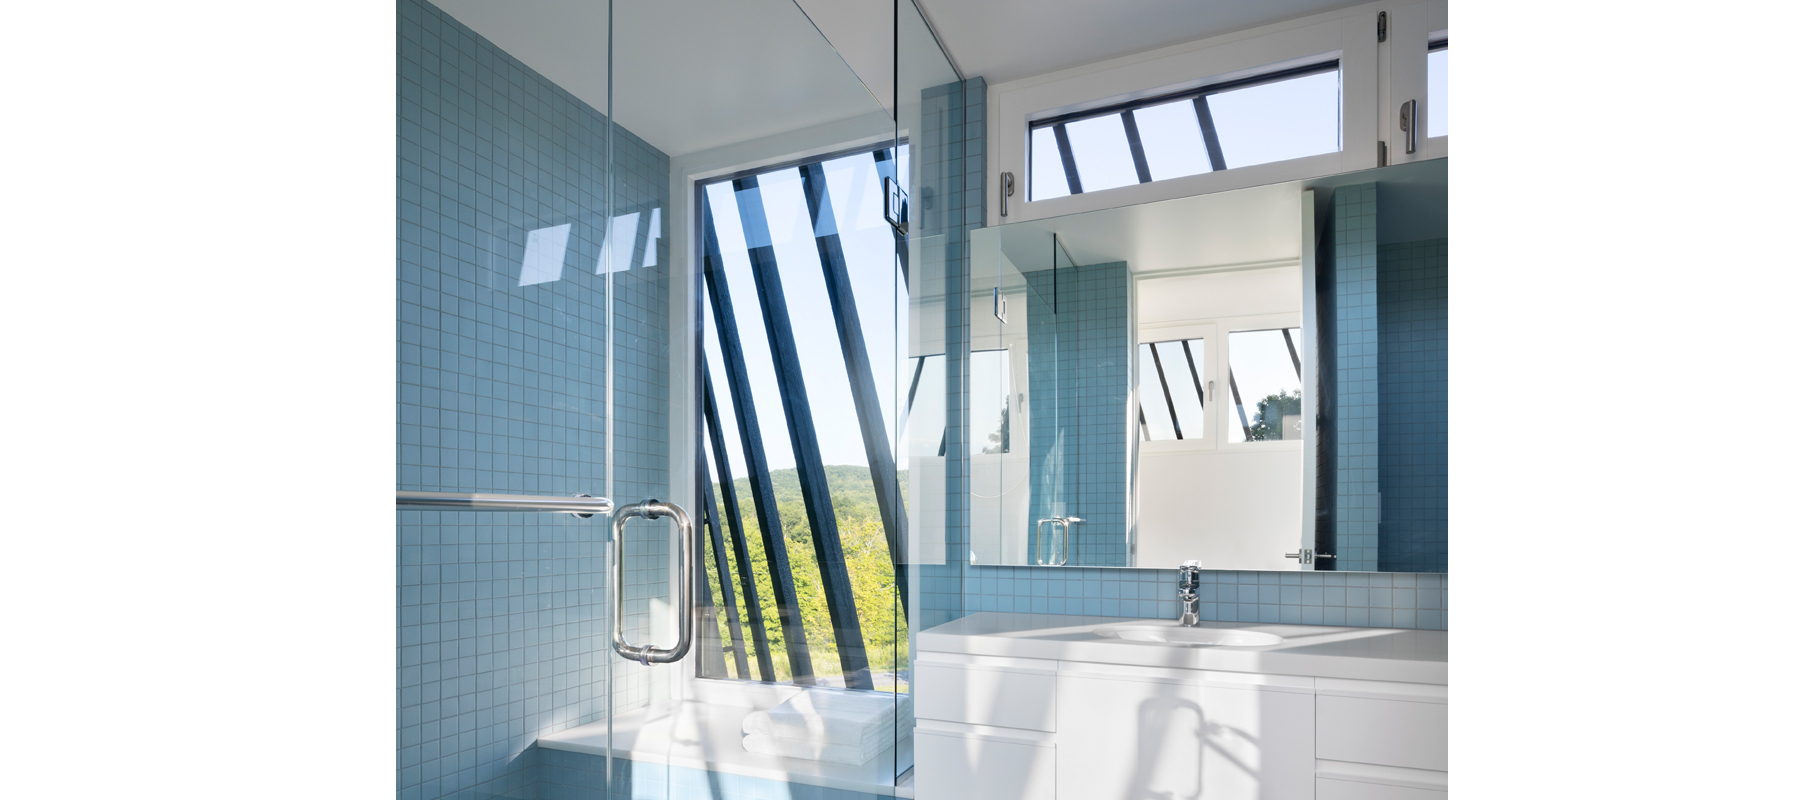 ................ master bathroom ................